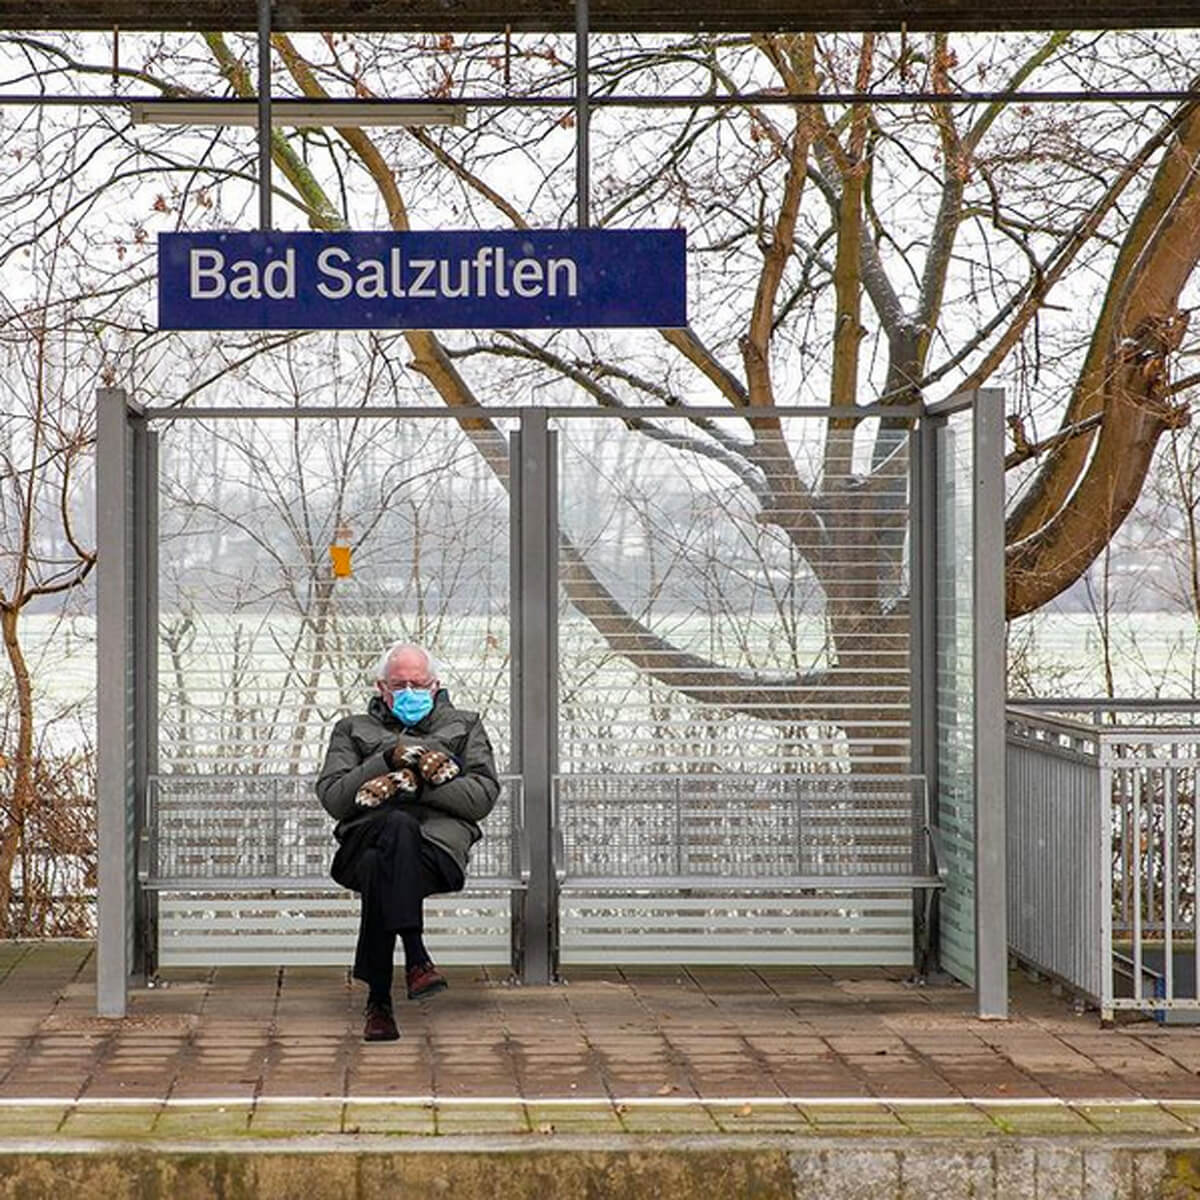 Bernie Sanders am Bahnhof in Bad Salzuflen